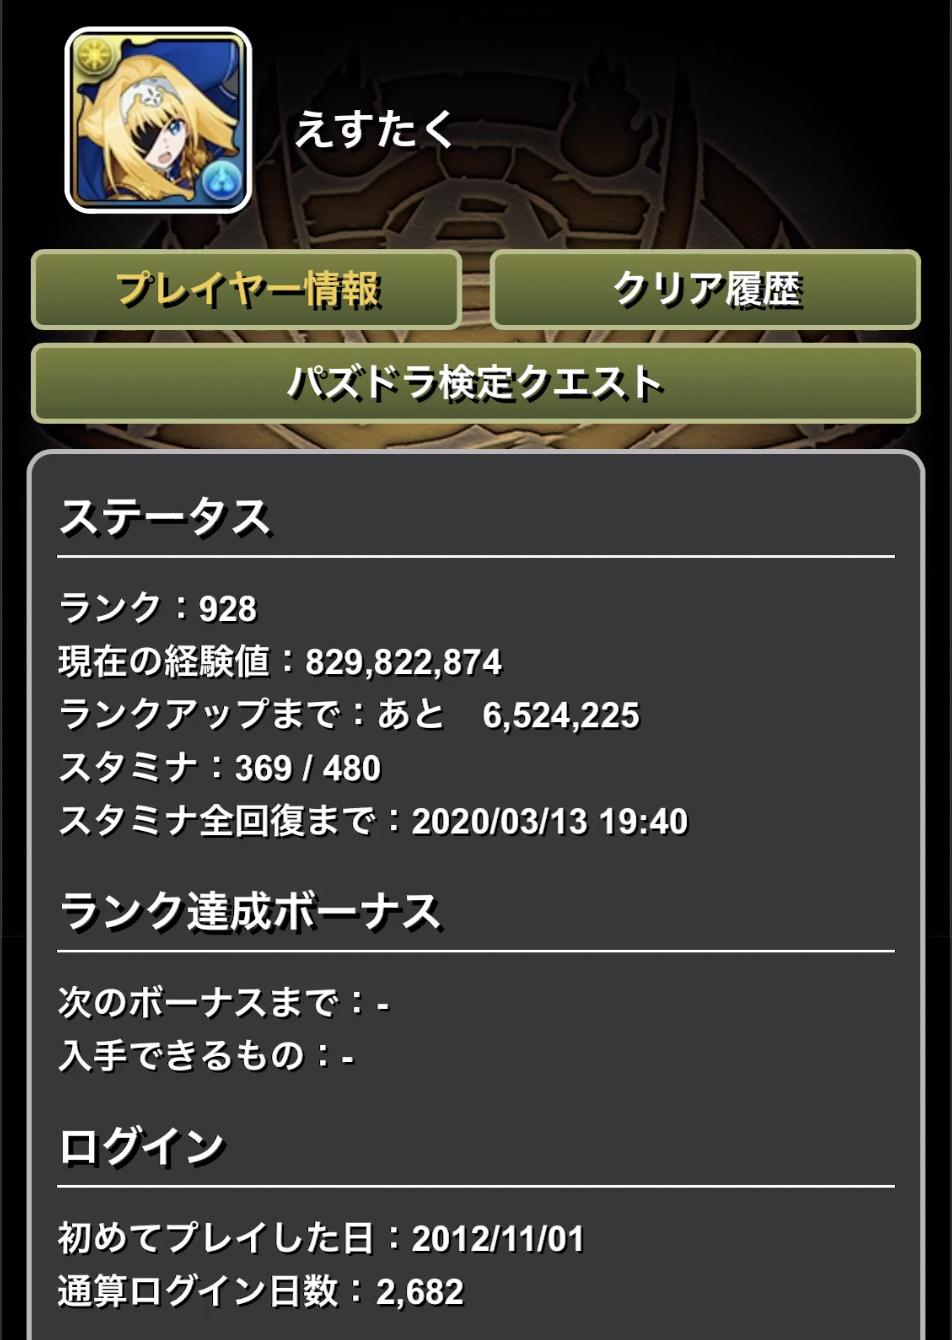 Pd20200313 1